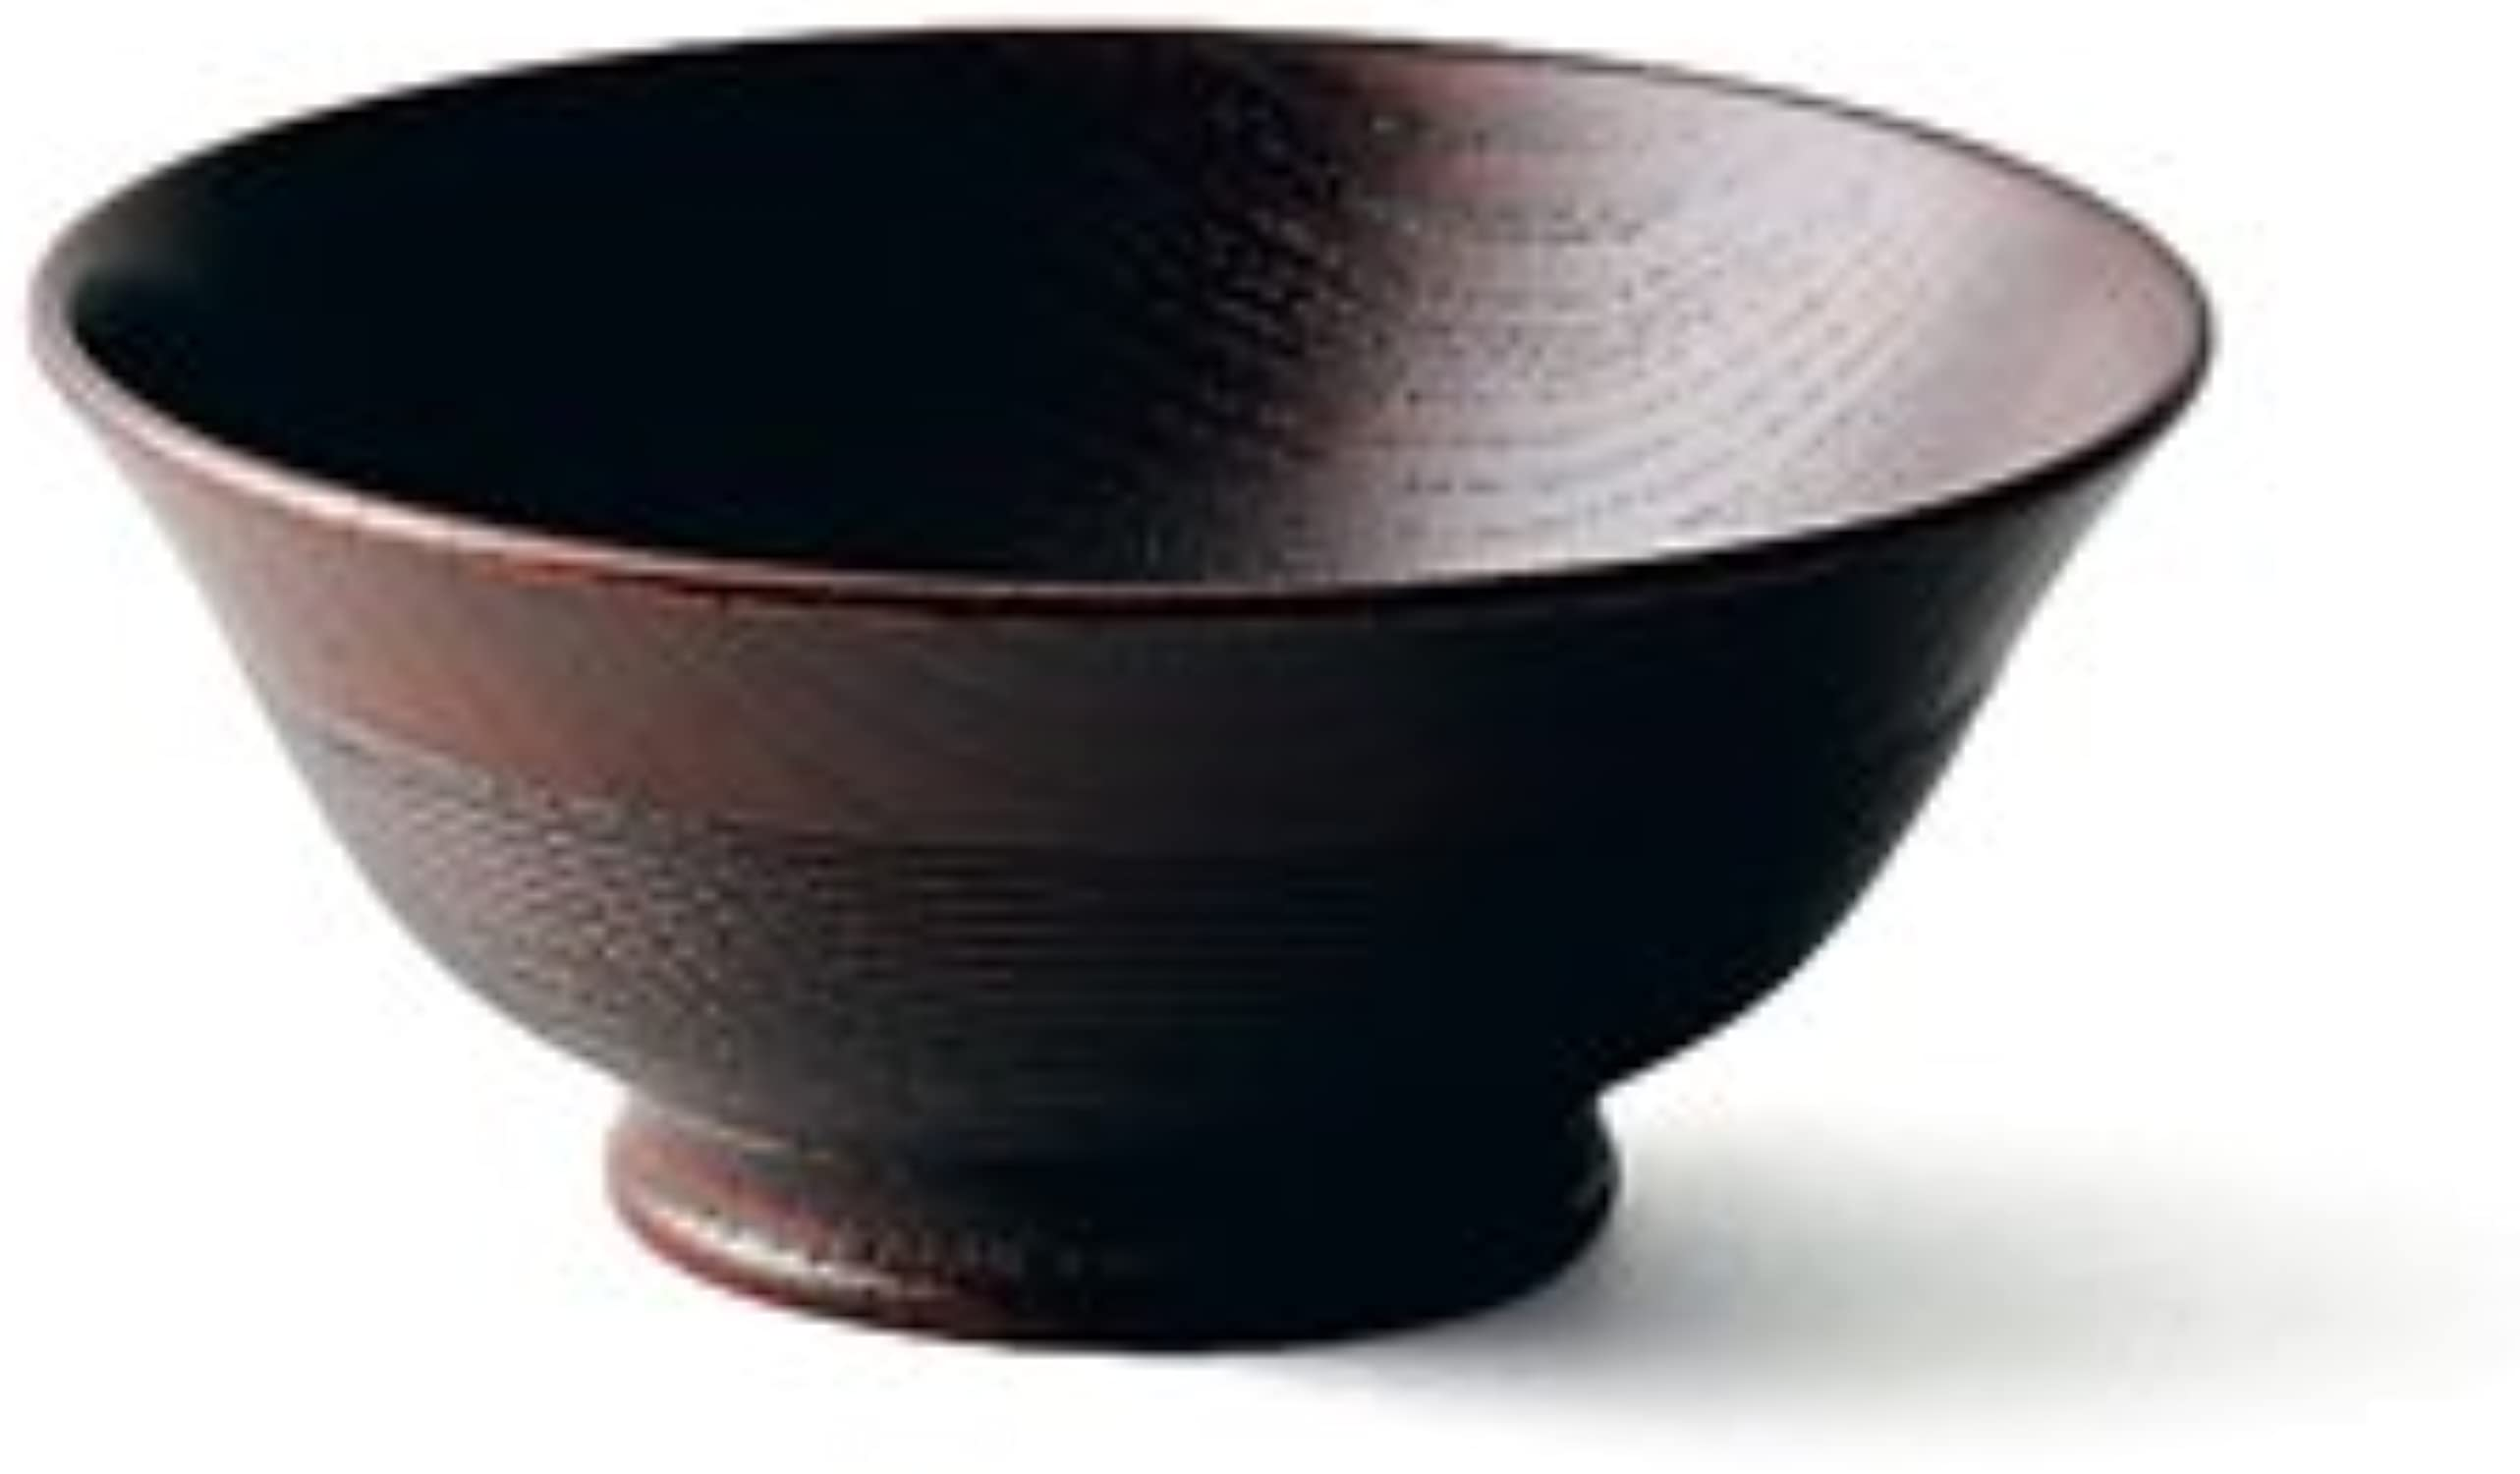 TOKYO MATCHA SELECTION - Oshima   Sensuji Gohanwan 2 Couleur - Japan Lacquareware Rice Bowl from Yahommeaka [Standard ship by Int'l e-packet  with Tracking & Insurance] (DARK marron)